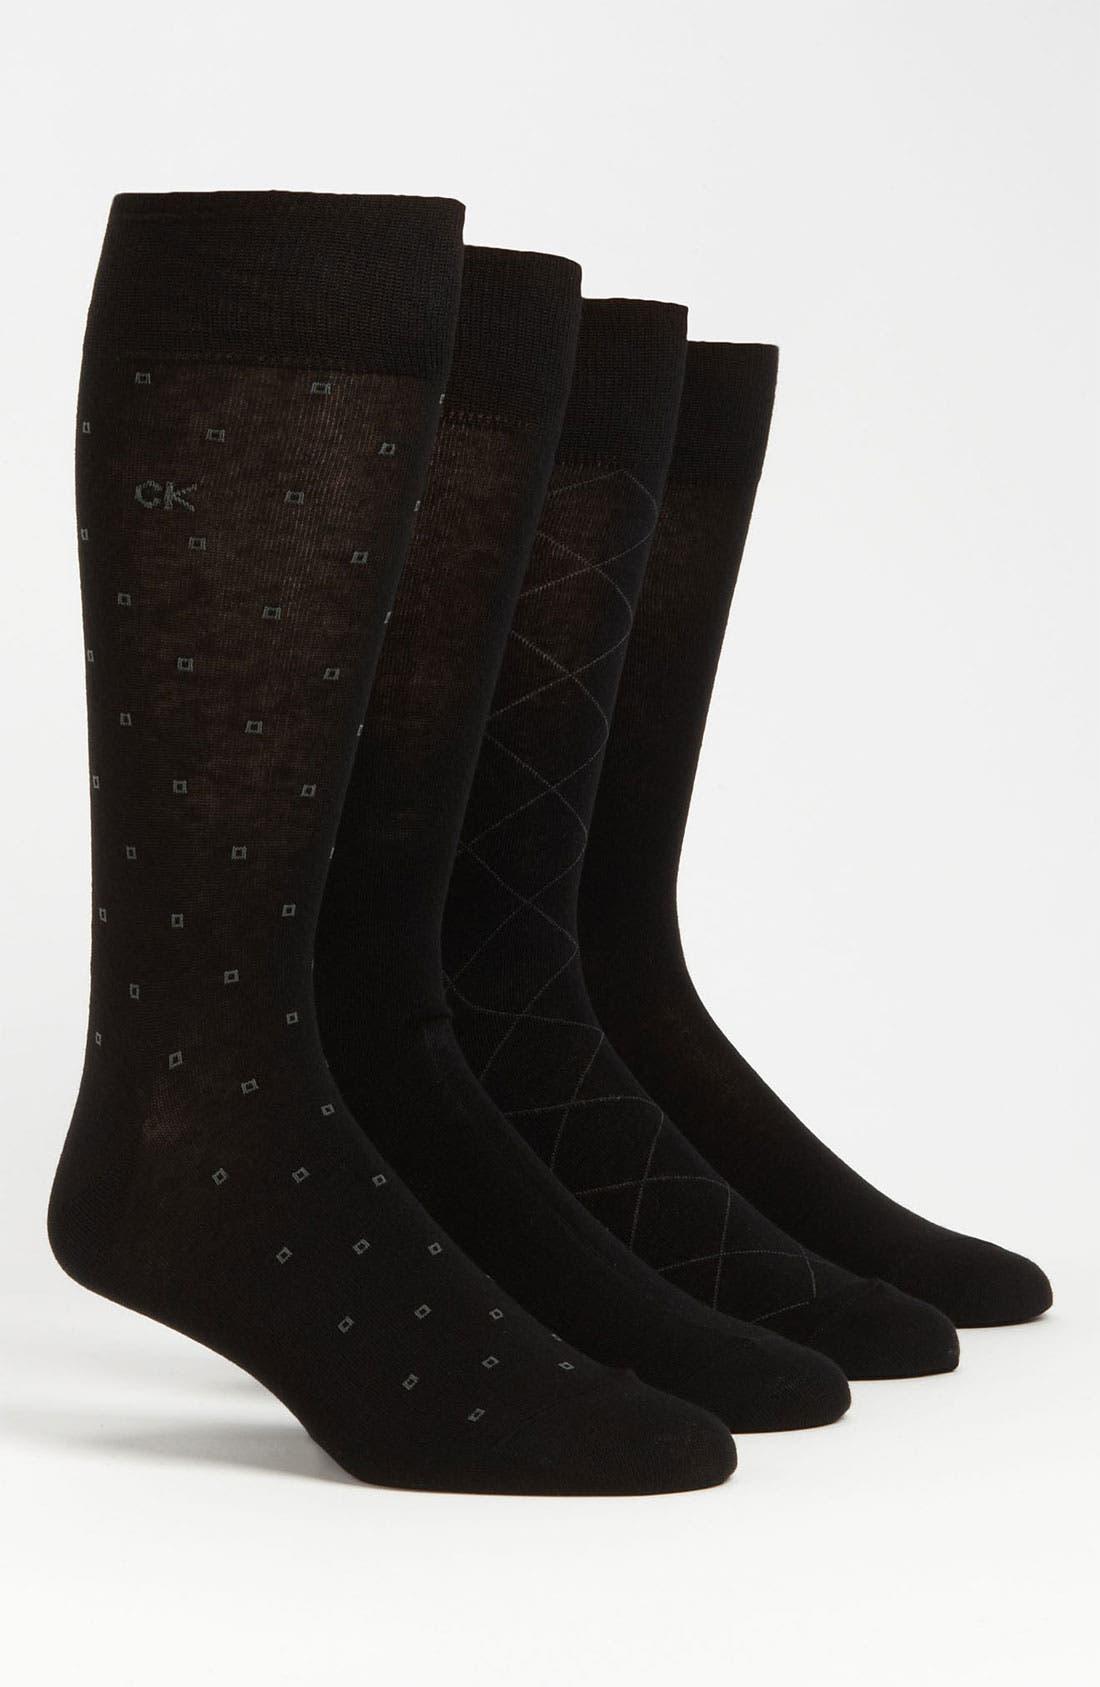 Main Image - Calvin Klein Patterned Socks (4-Pack)